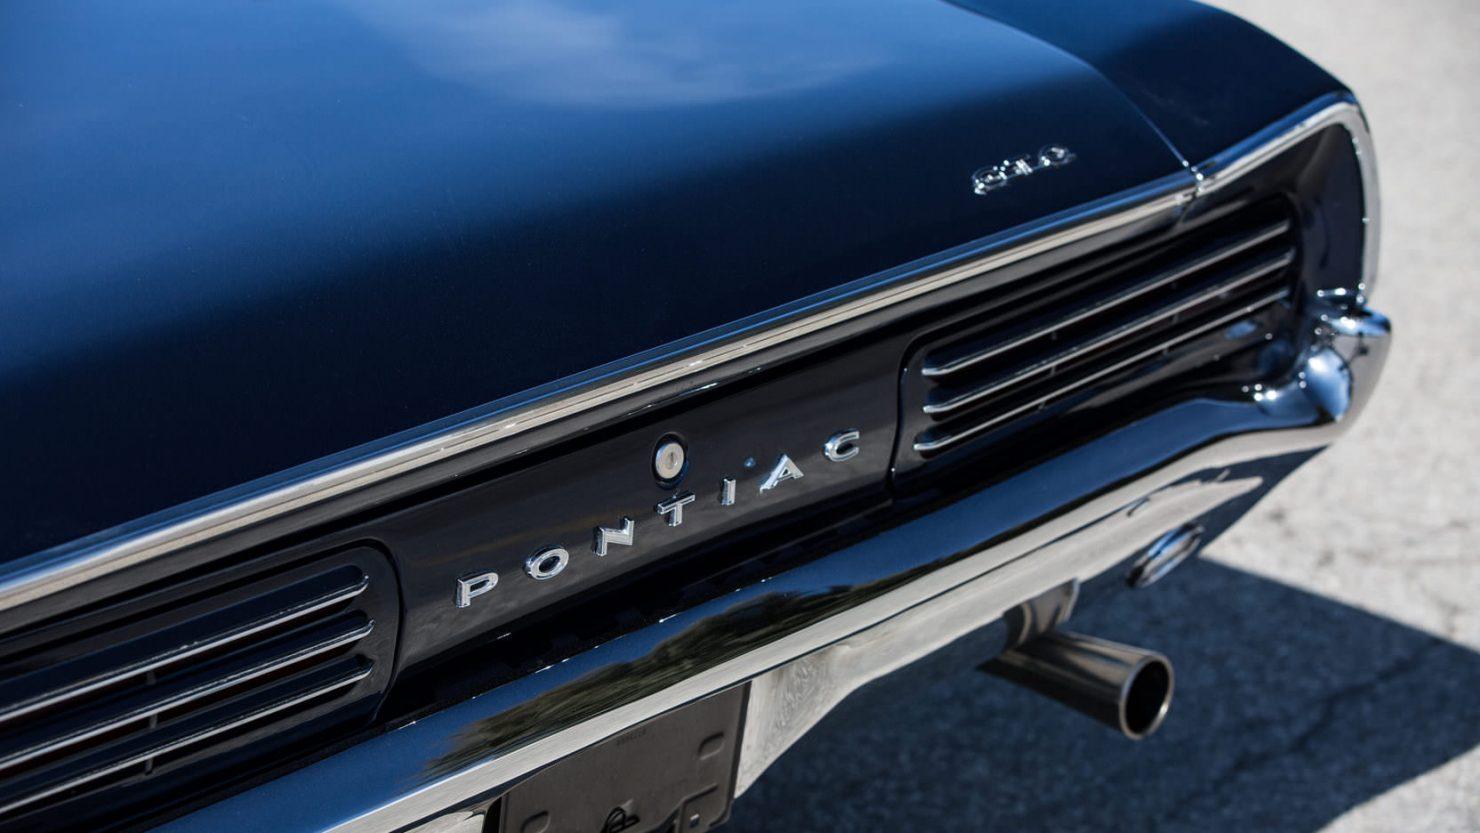 Pontiac GTO Tri Power 10 1480x833 - 1966 Pontiac GTO Tri-Power